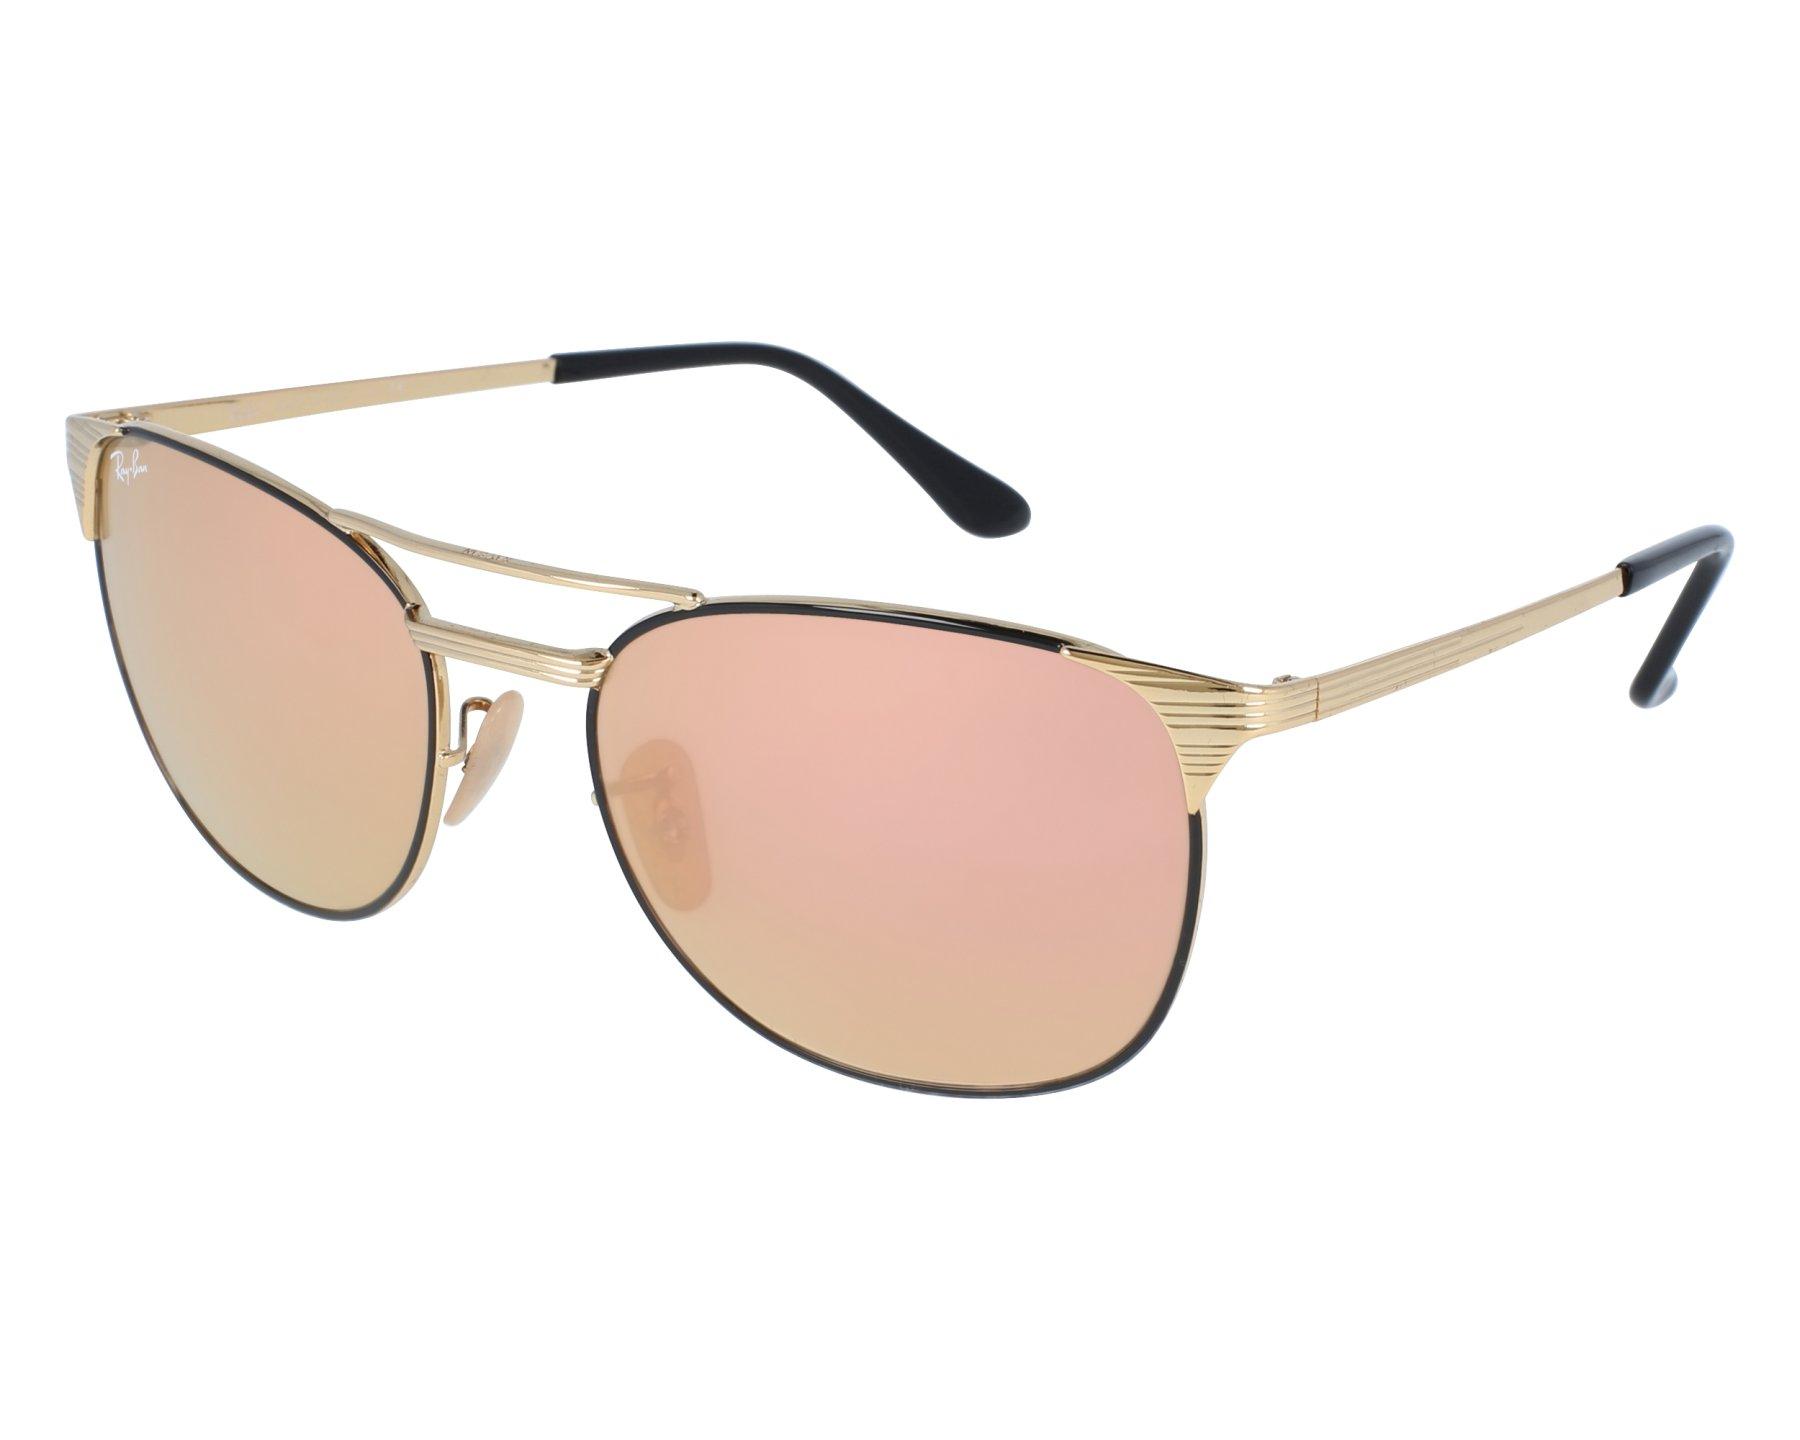 6534837b390 Sunglasses Ray-Ban RB-3429-M 9000 Z2 58-19 Gold